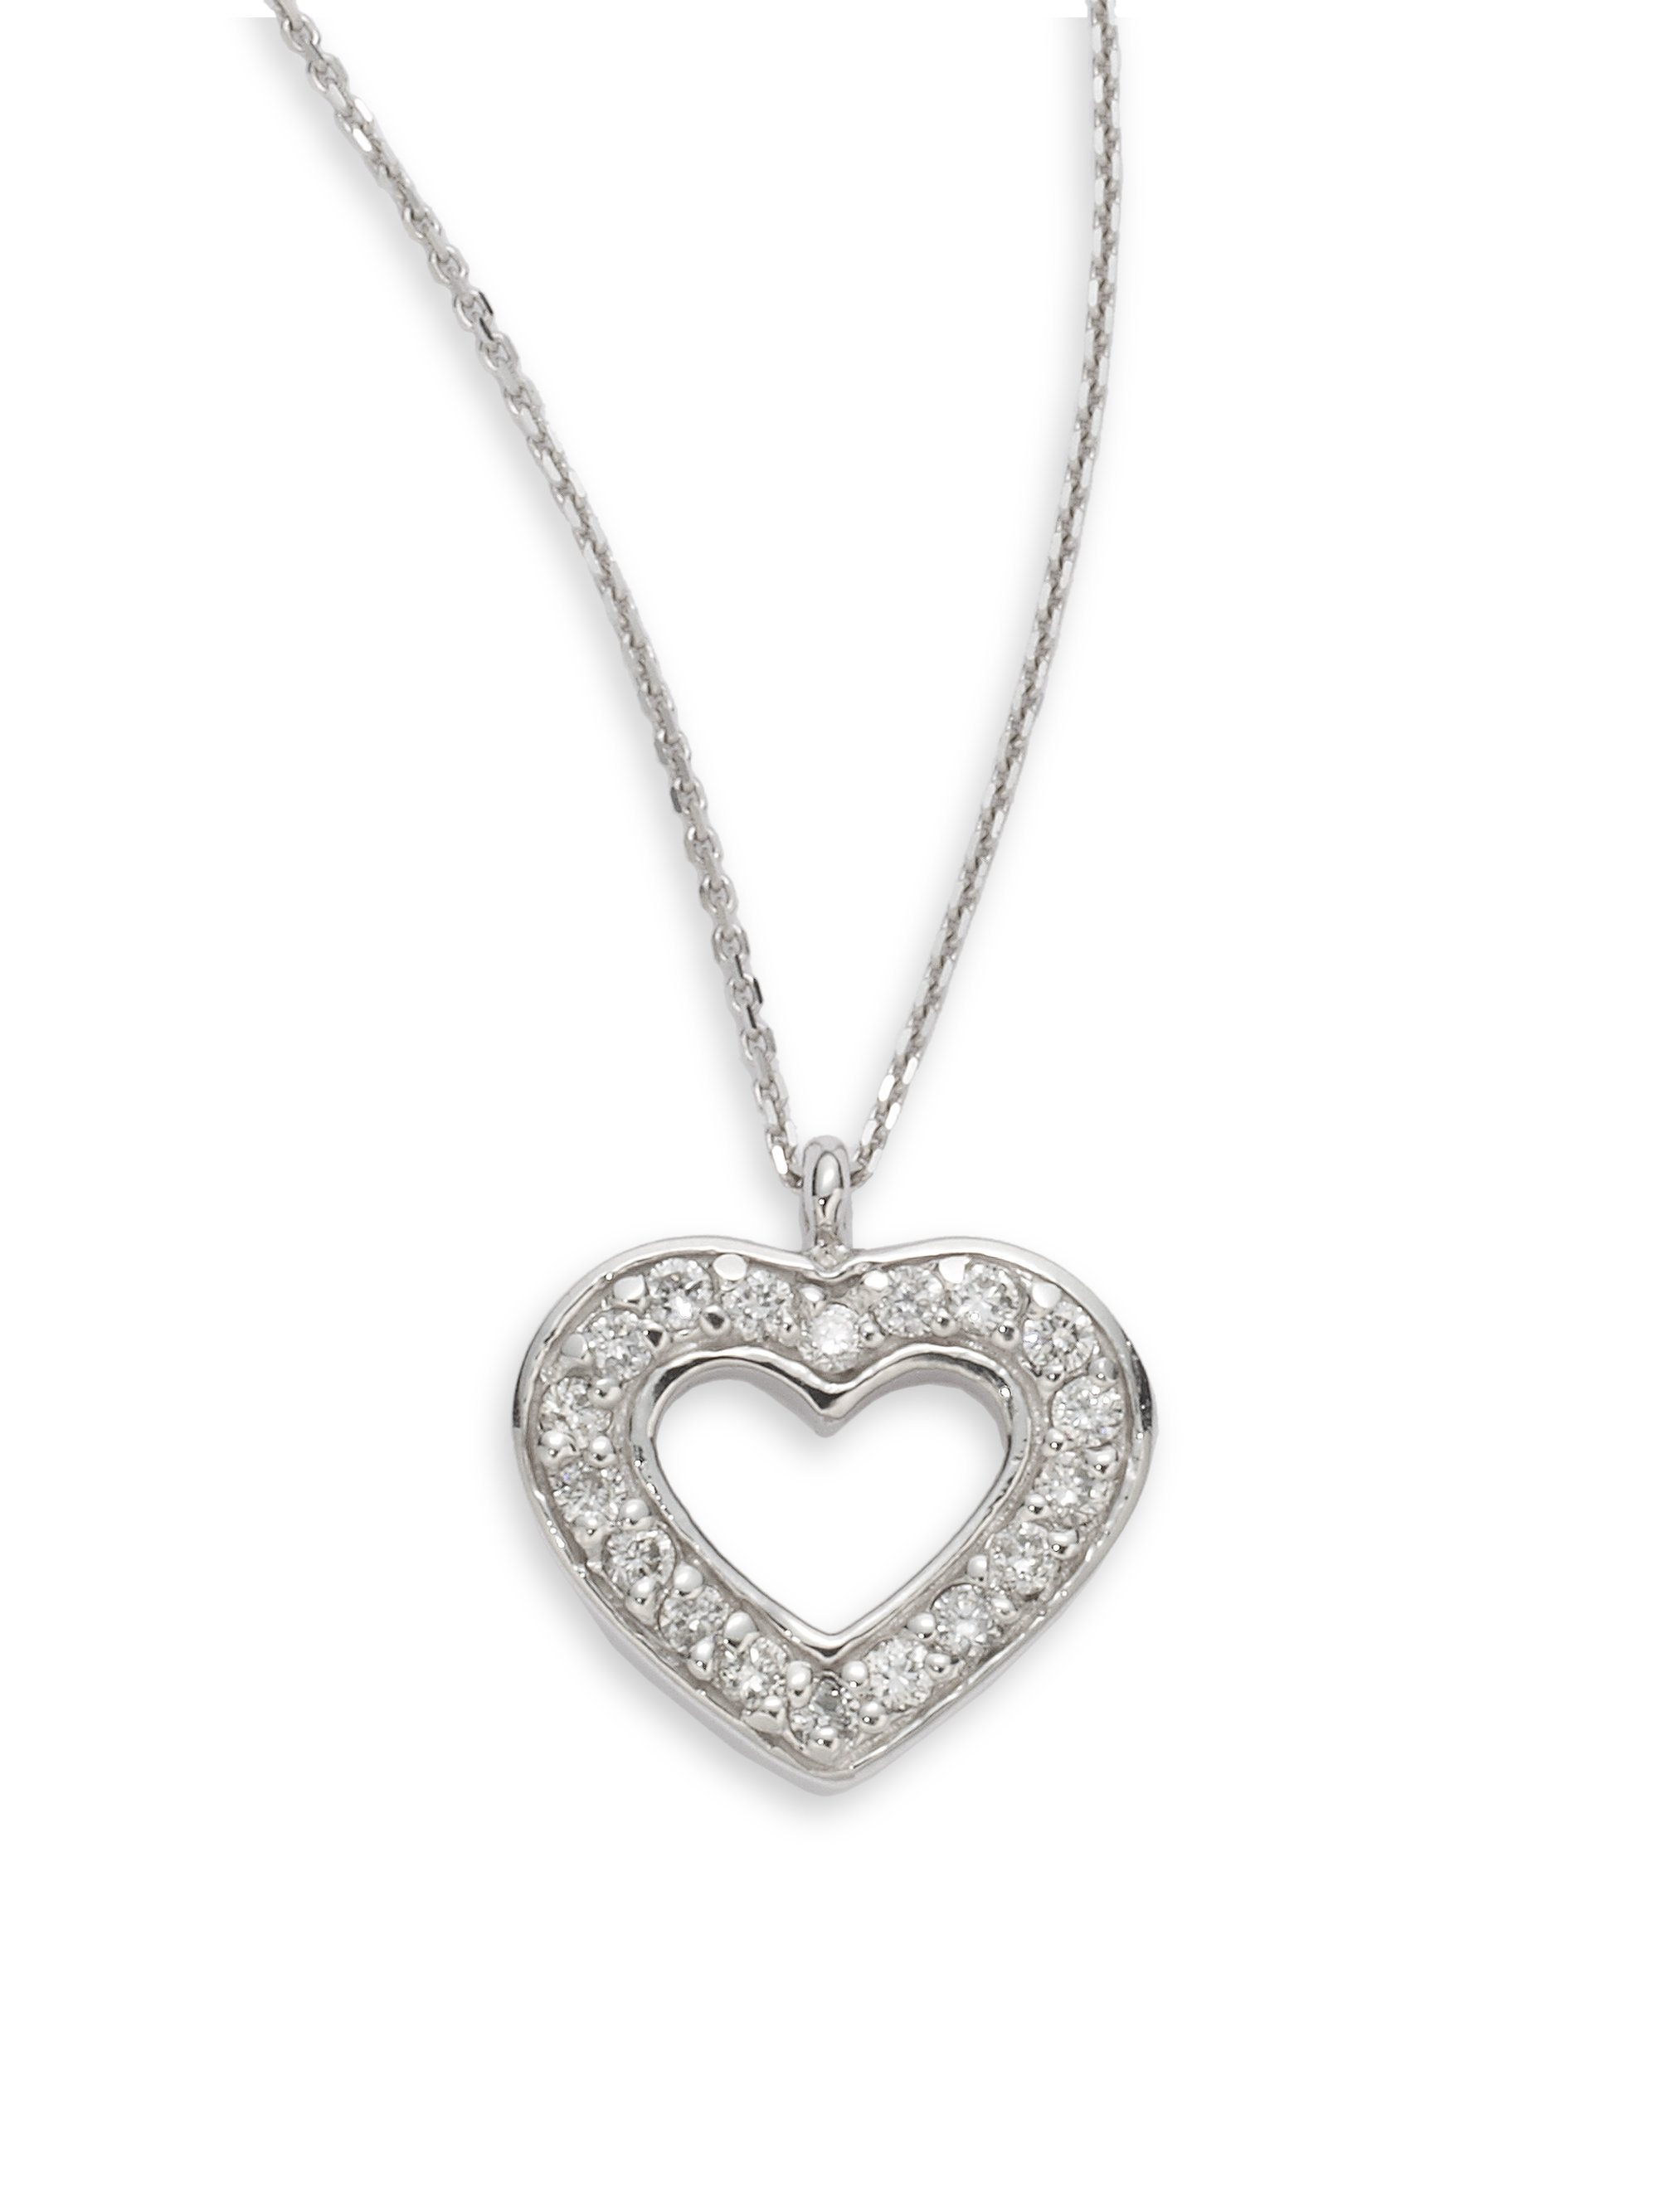 Kc designs Diamond Open Heart Pendant Necklace in Metallic